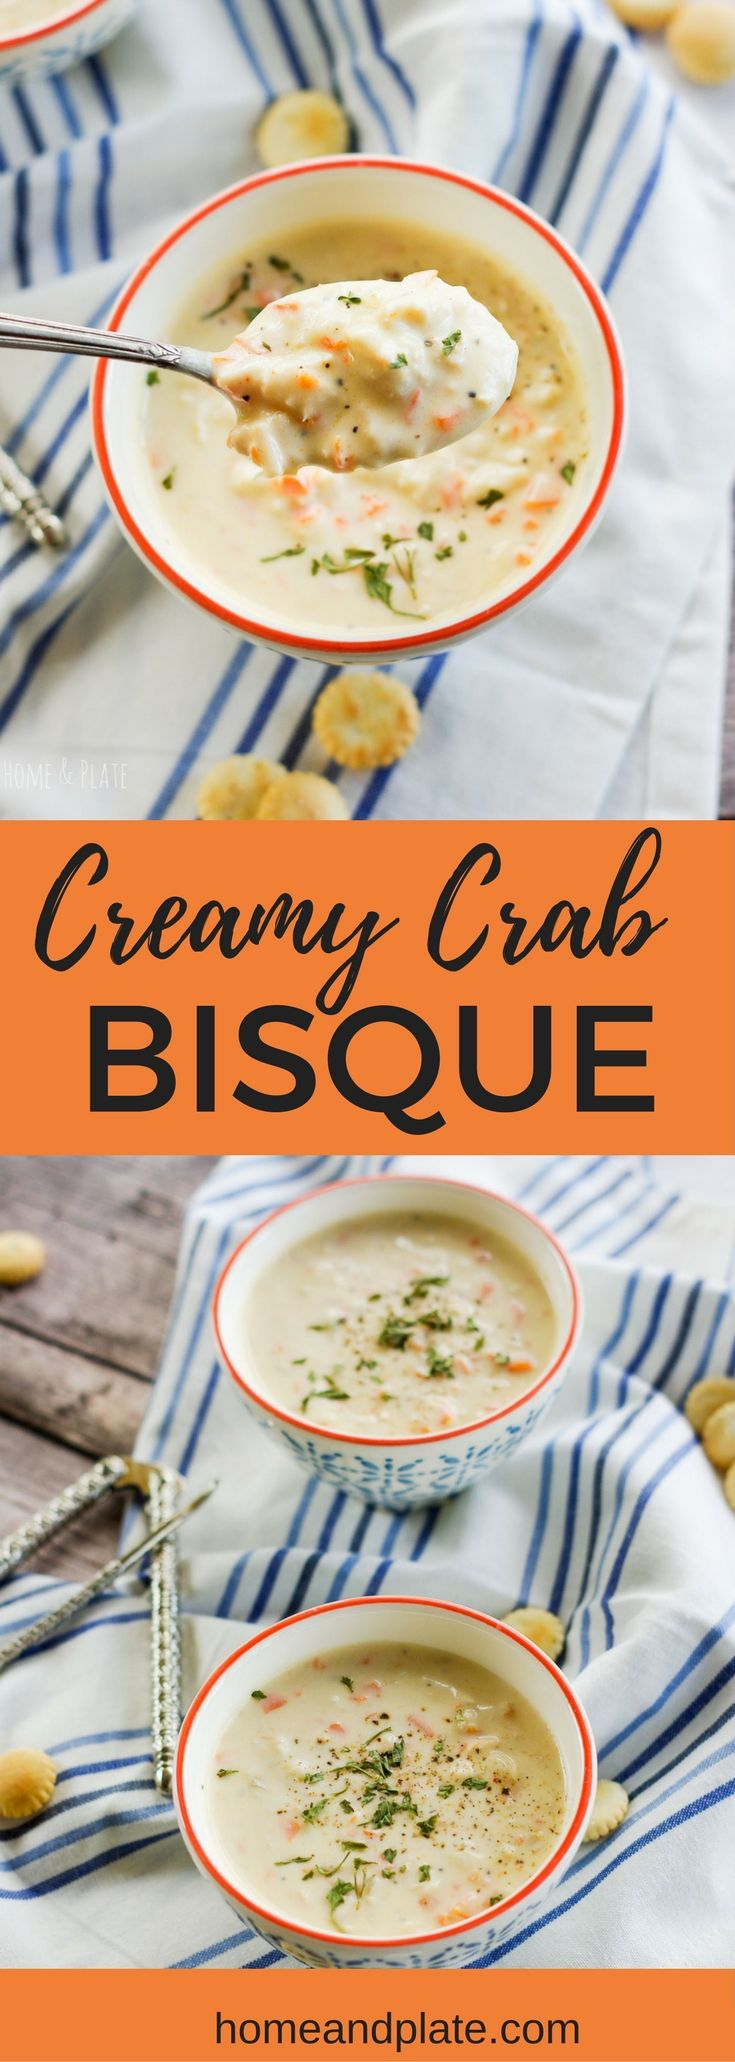 Creamy Crab Bisque | www.homeandplate.com | Rich a…